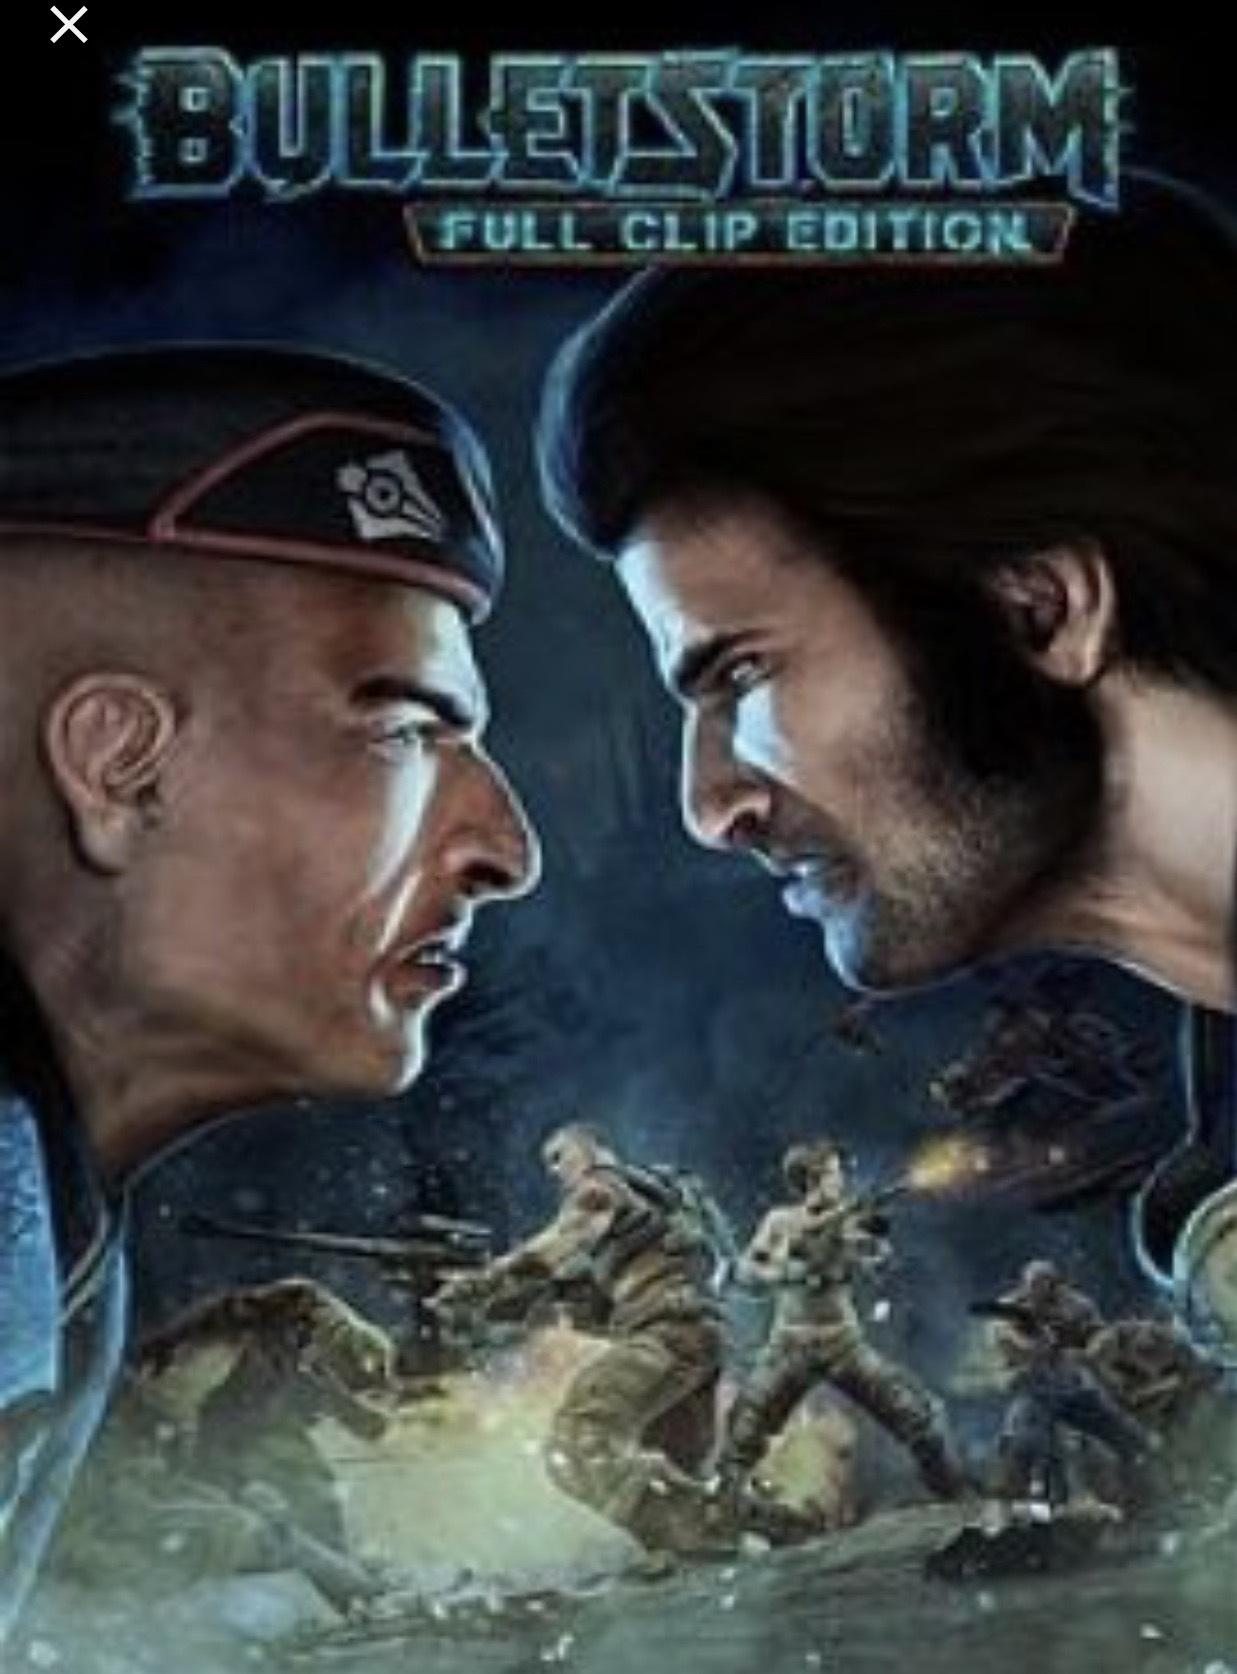 Bulletstorm: Full Clip Edition PS4 - £8.99 @ PlayStation Store